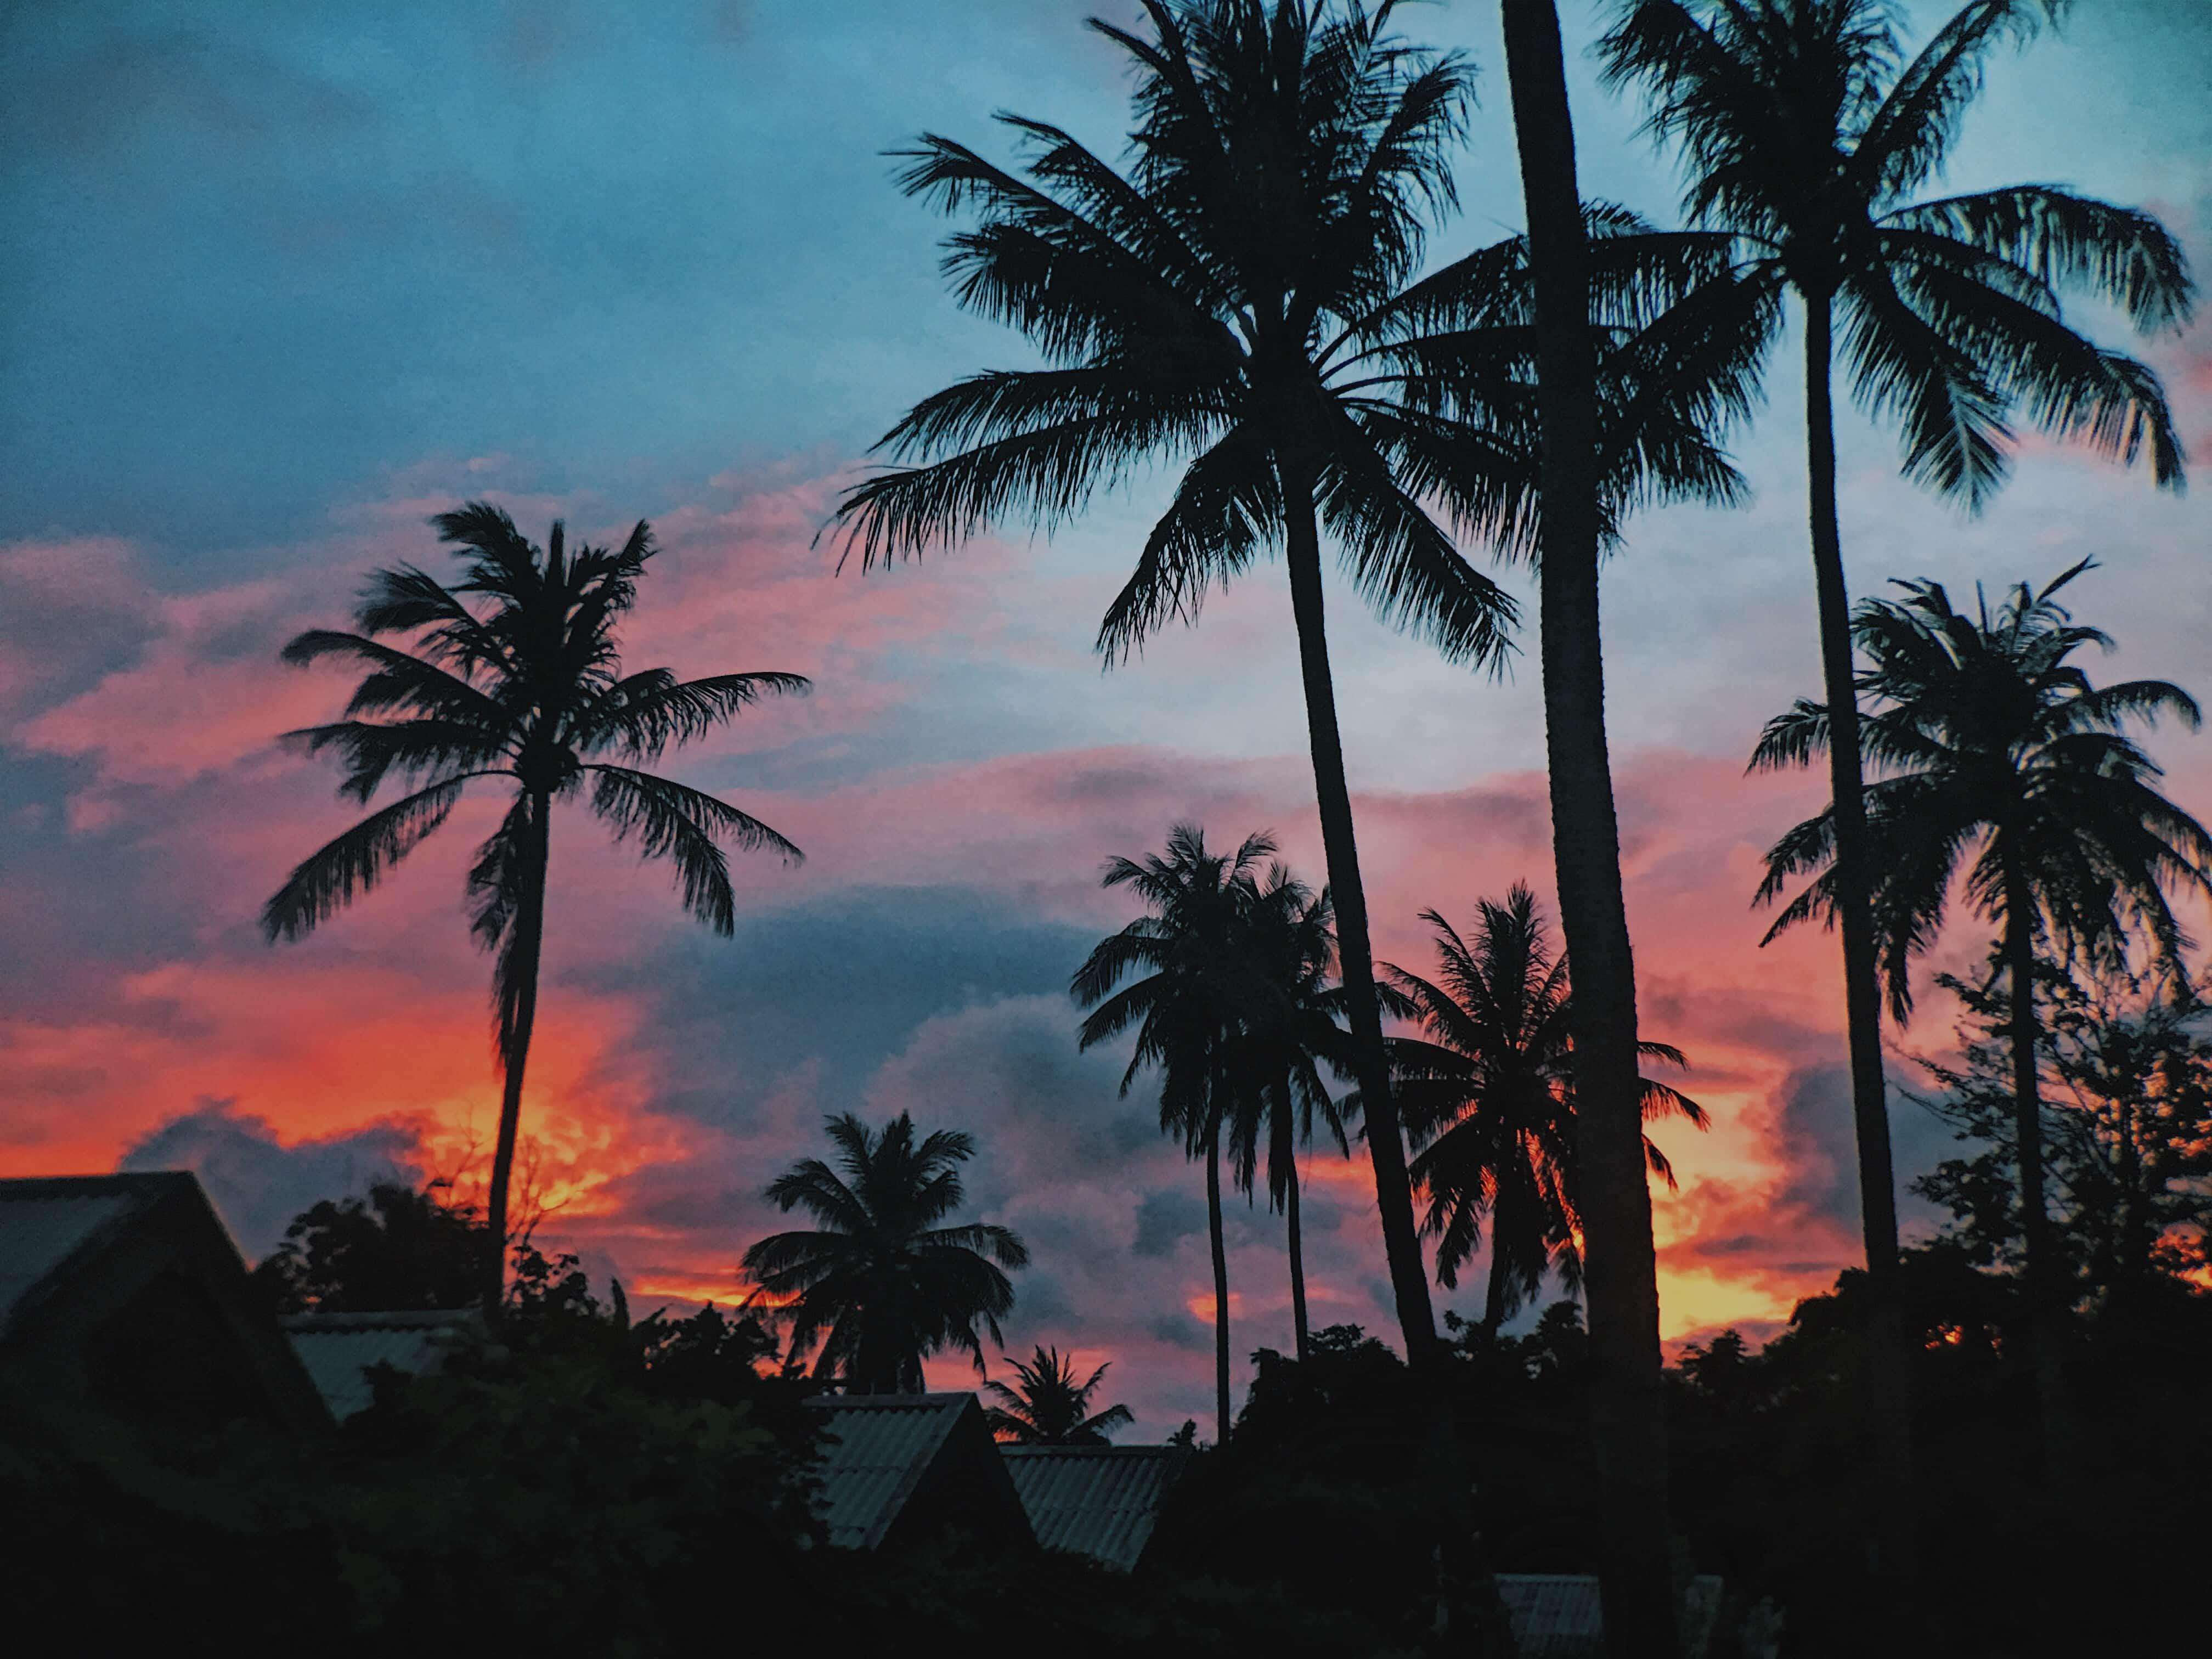 Sunset at X2 Koh Samui Resort